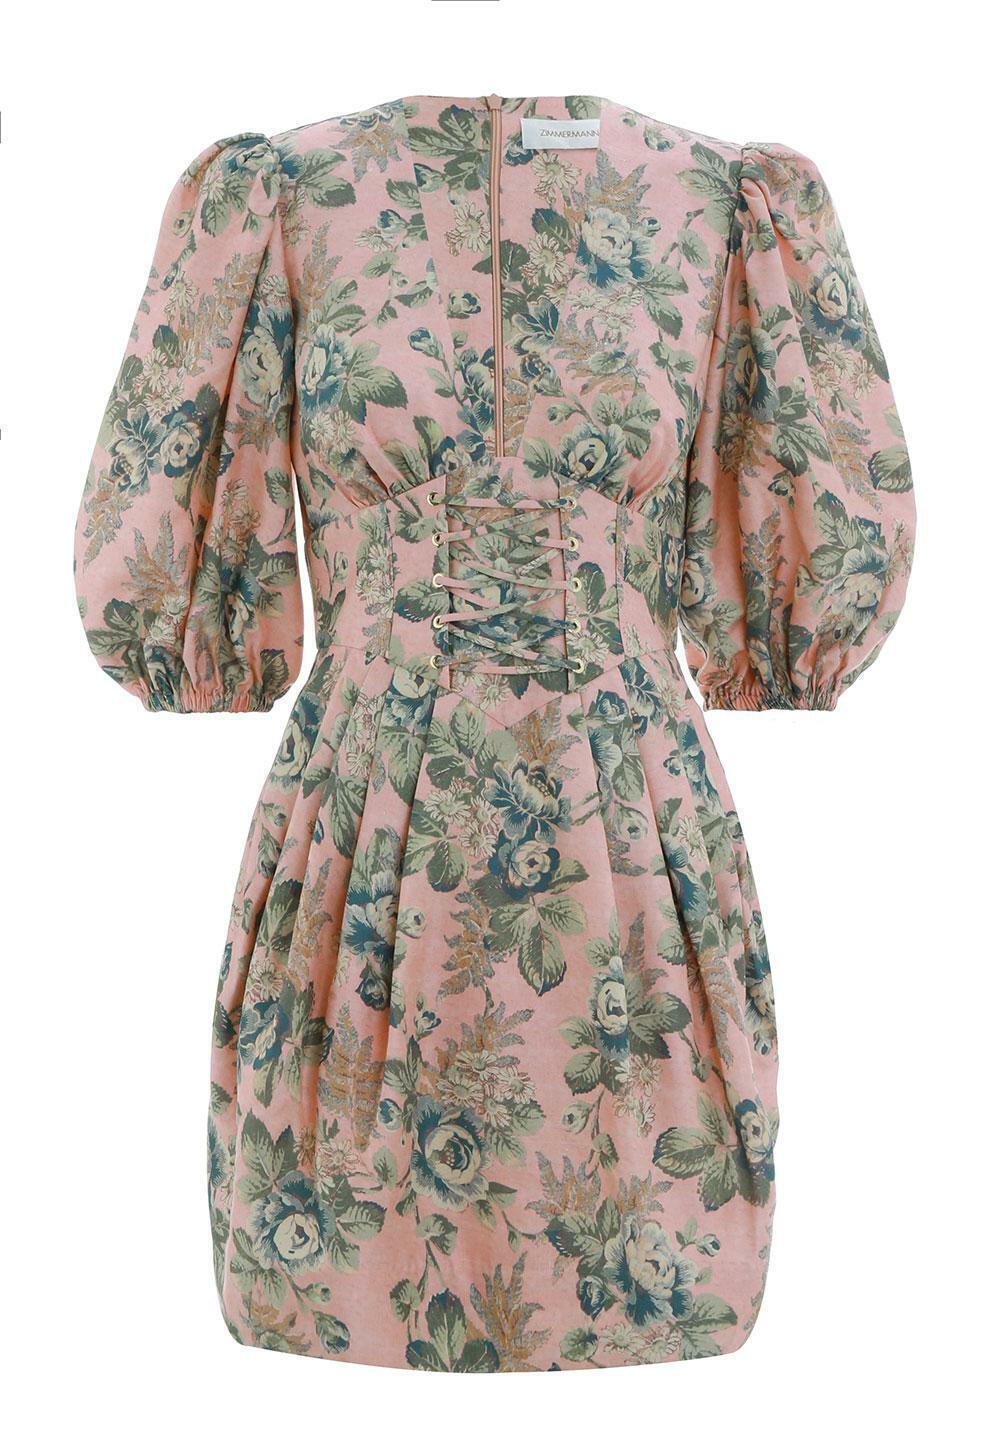 925 Zimmermann Tempest Floral Lace -up Dress Storlek 3 US 8 -10